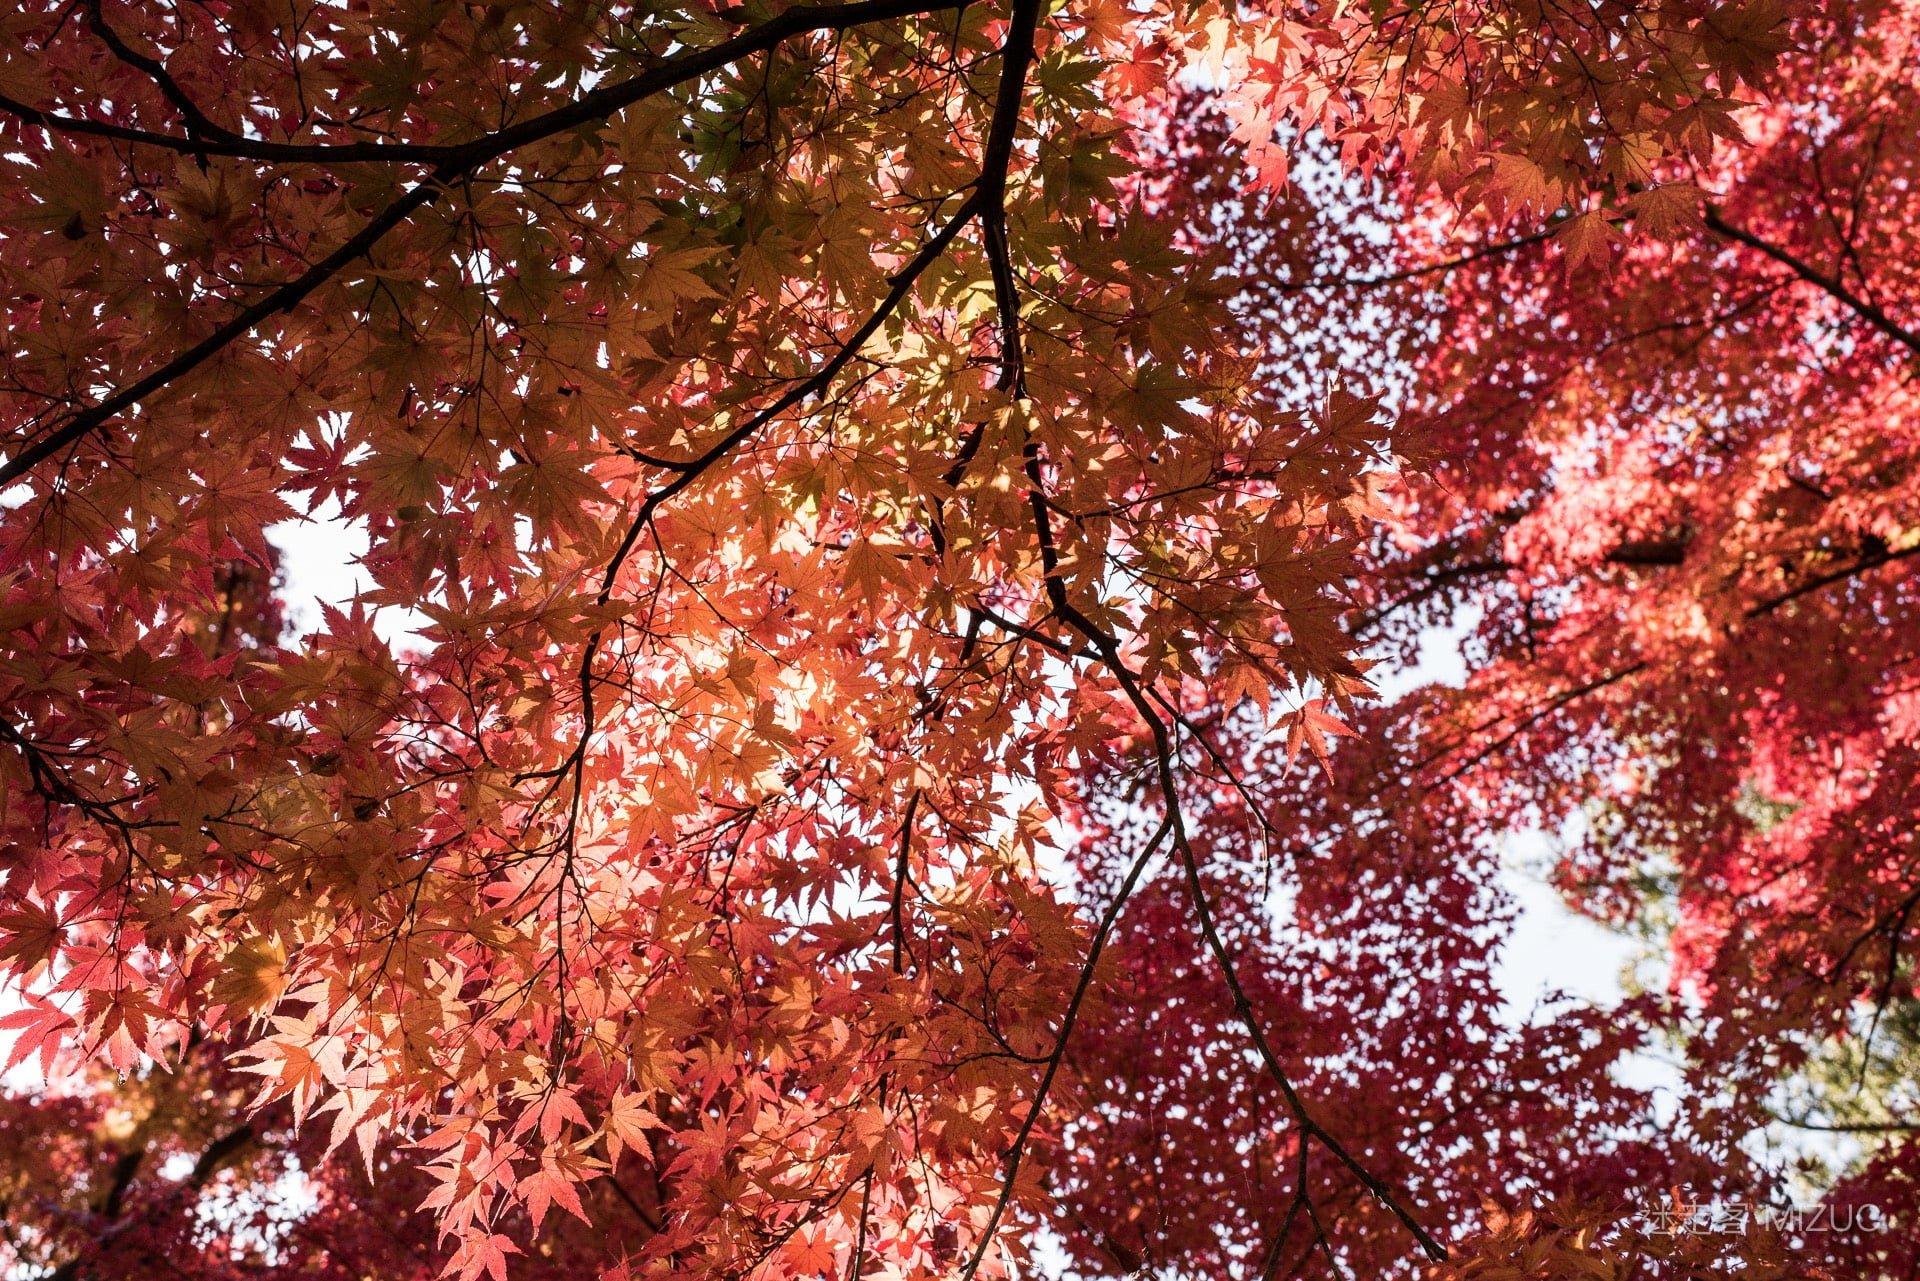 201711 Ibaraki Tochigi Gunma Japan Travel By RentalCar 86 日本自駕旅遊/北關東三縣「茨城、櫪木、群馬」秋天美食、溫泉與瀑布秘境百景(精選照片分享)